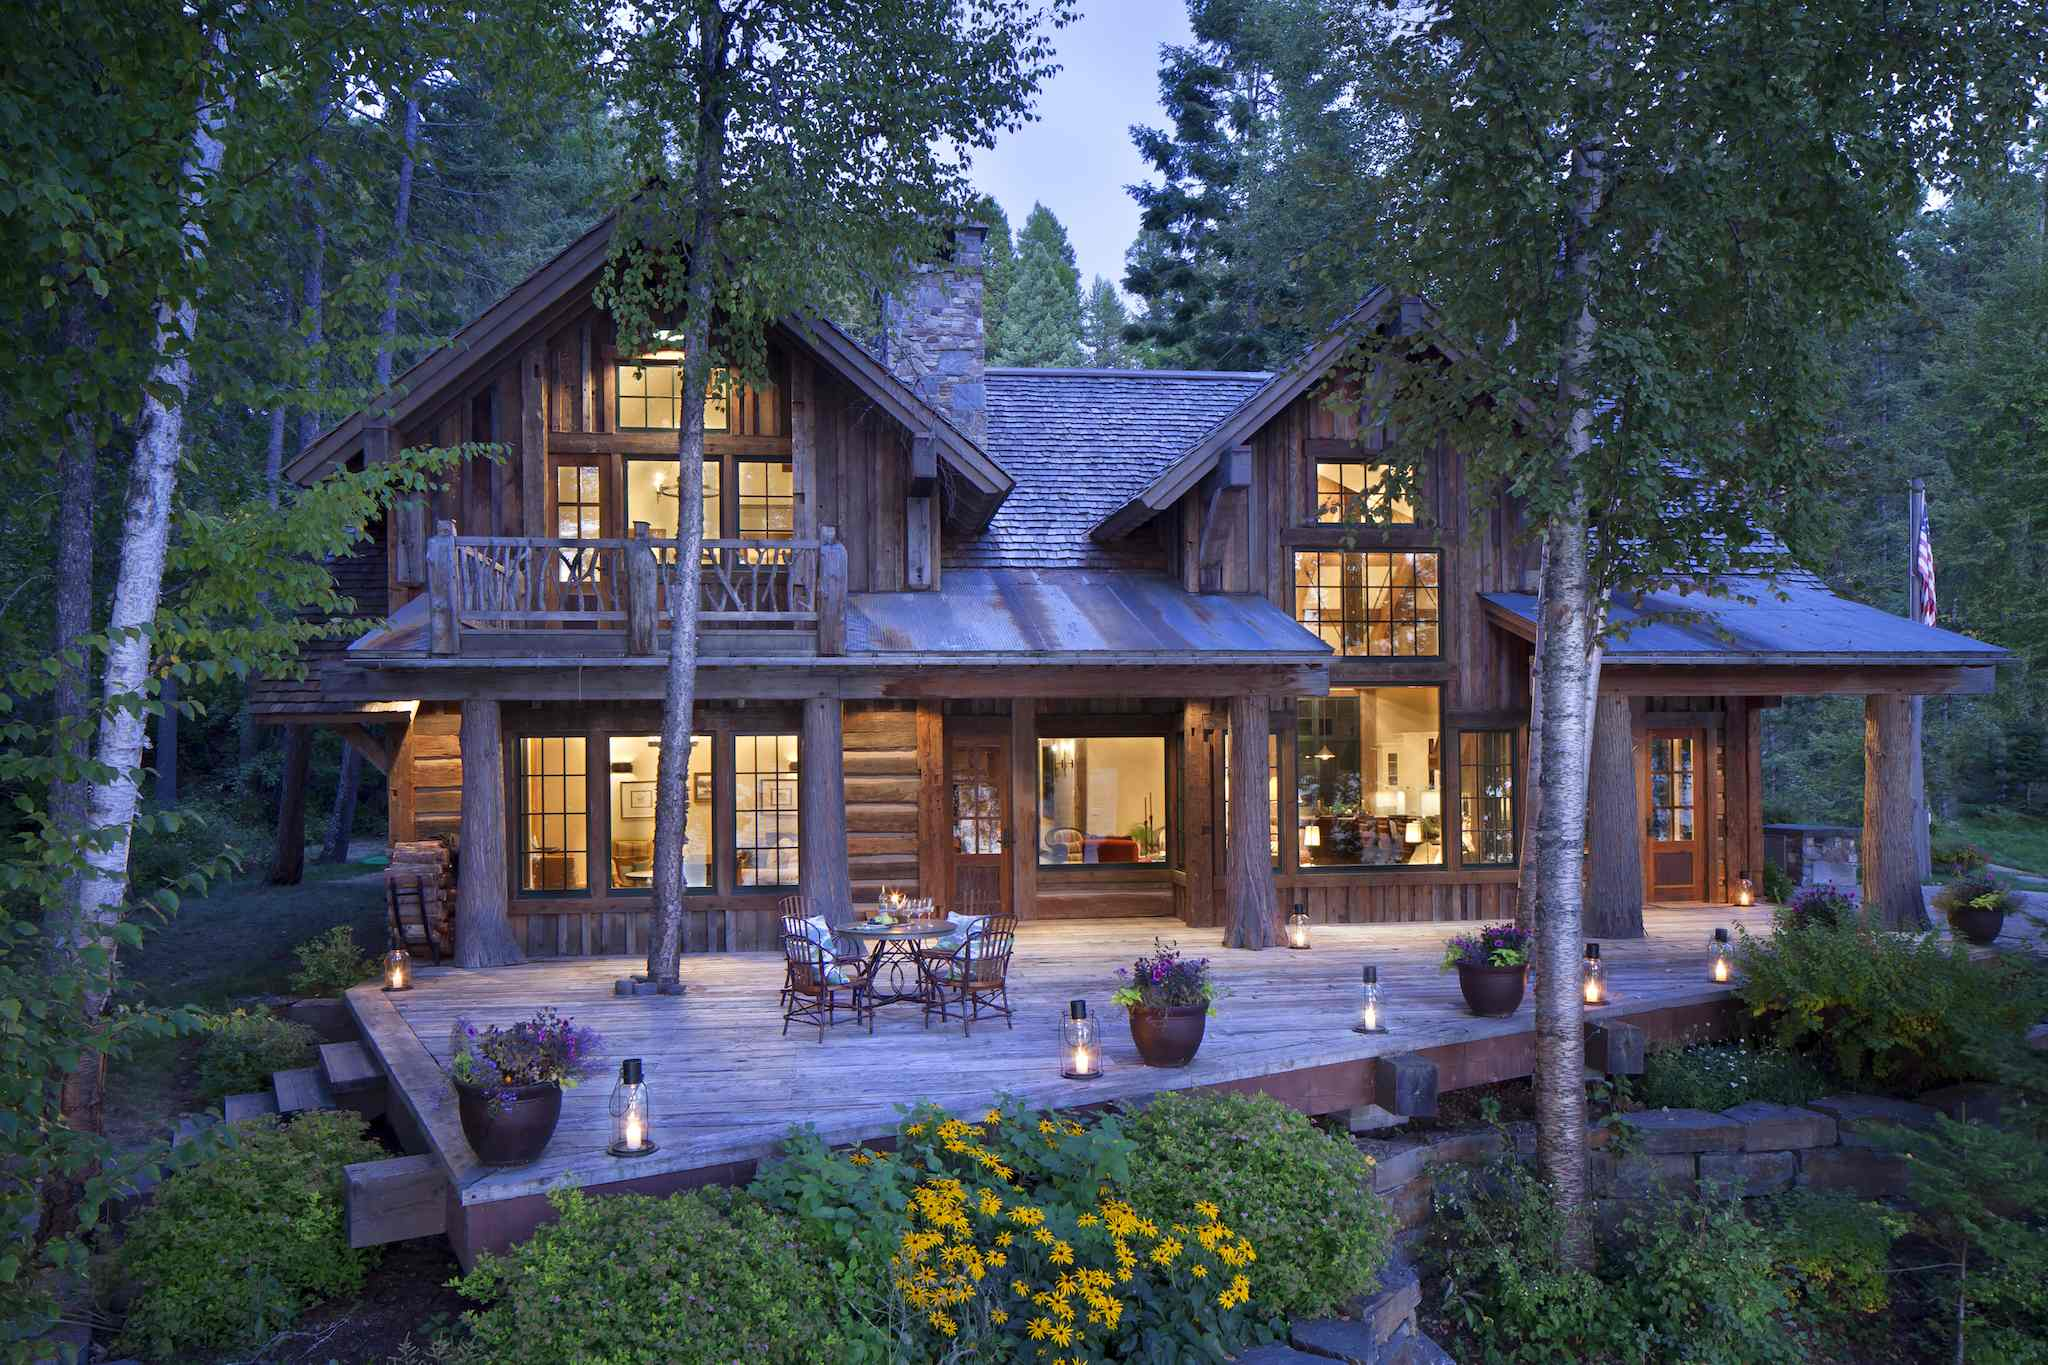 Cedar Camp - Whitefish, Montana